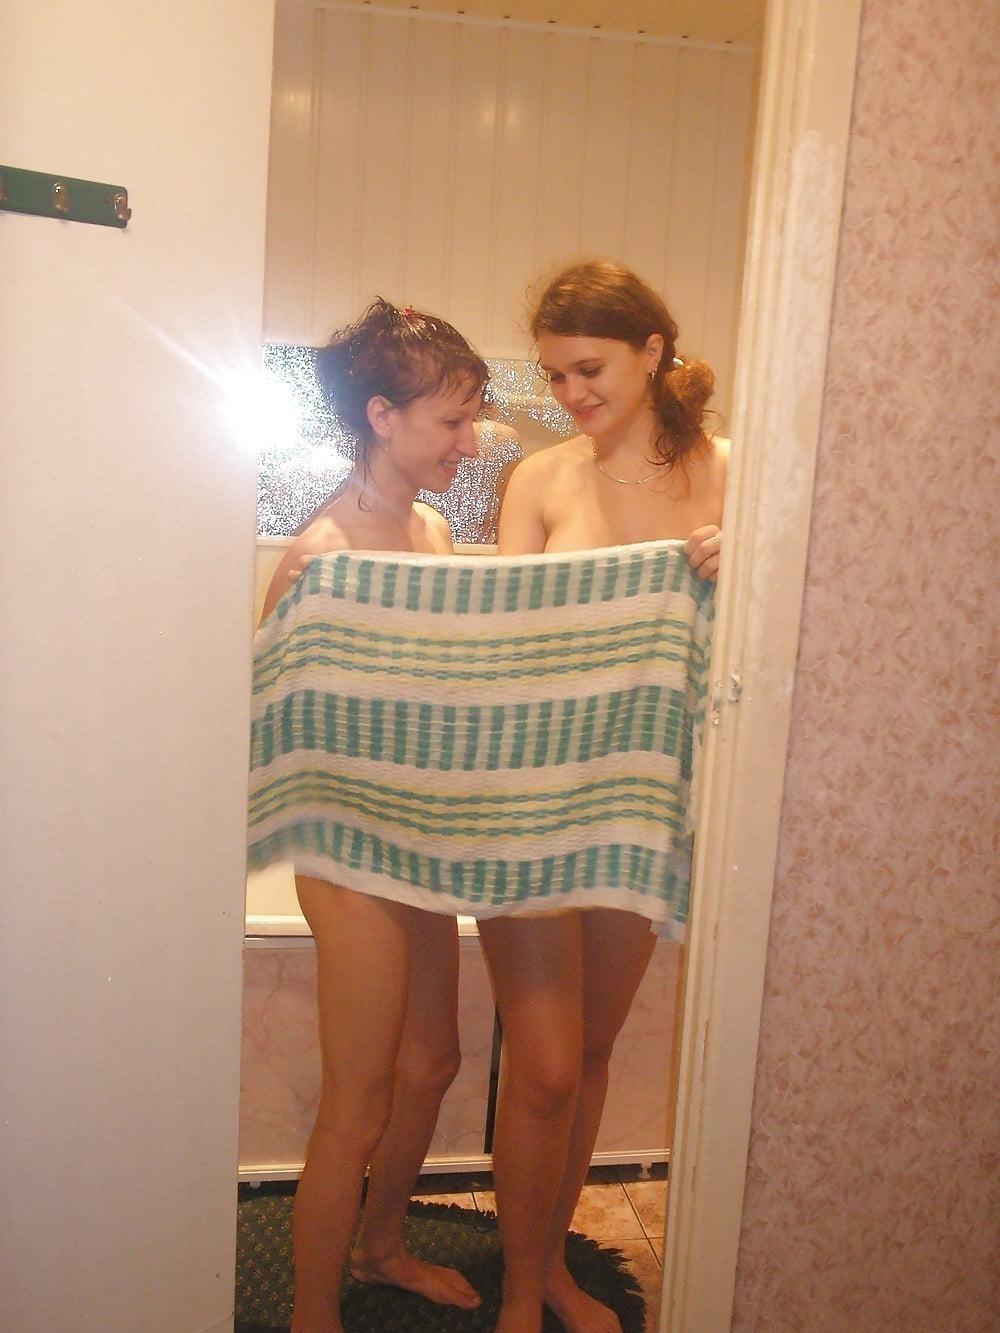 Hot lesbians make out naked-7527